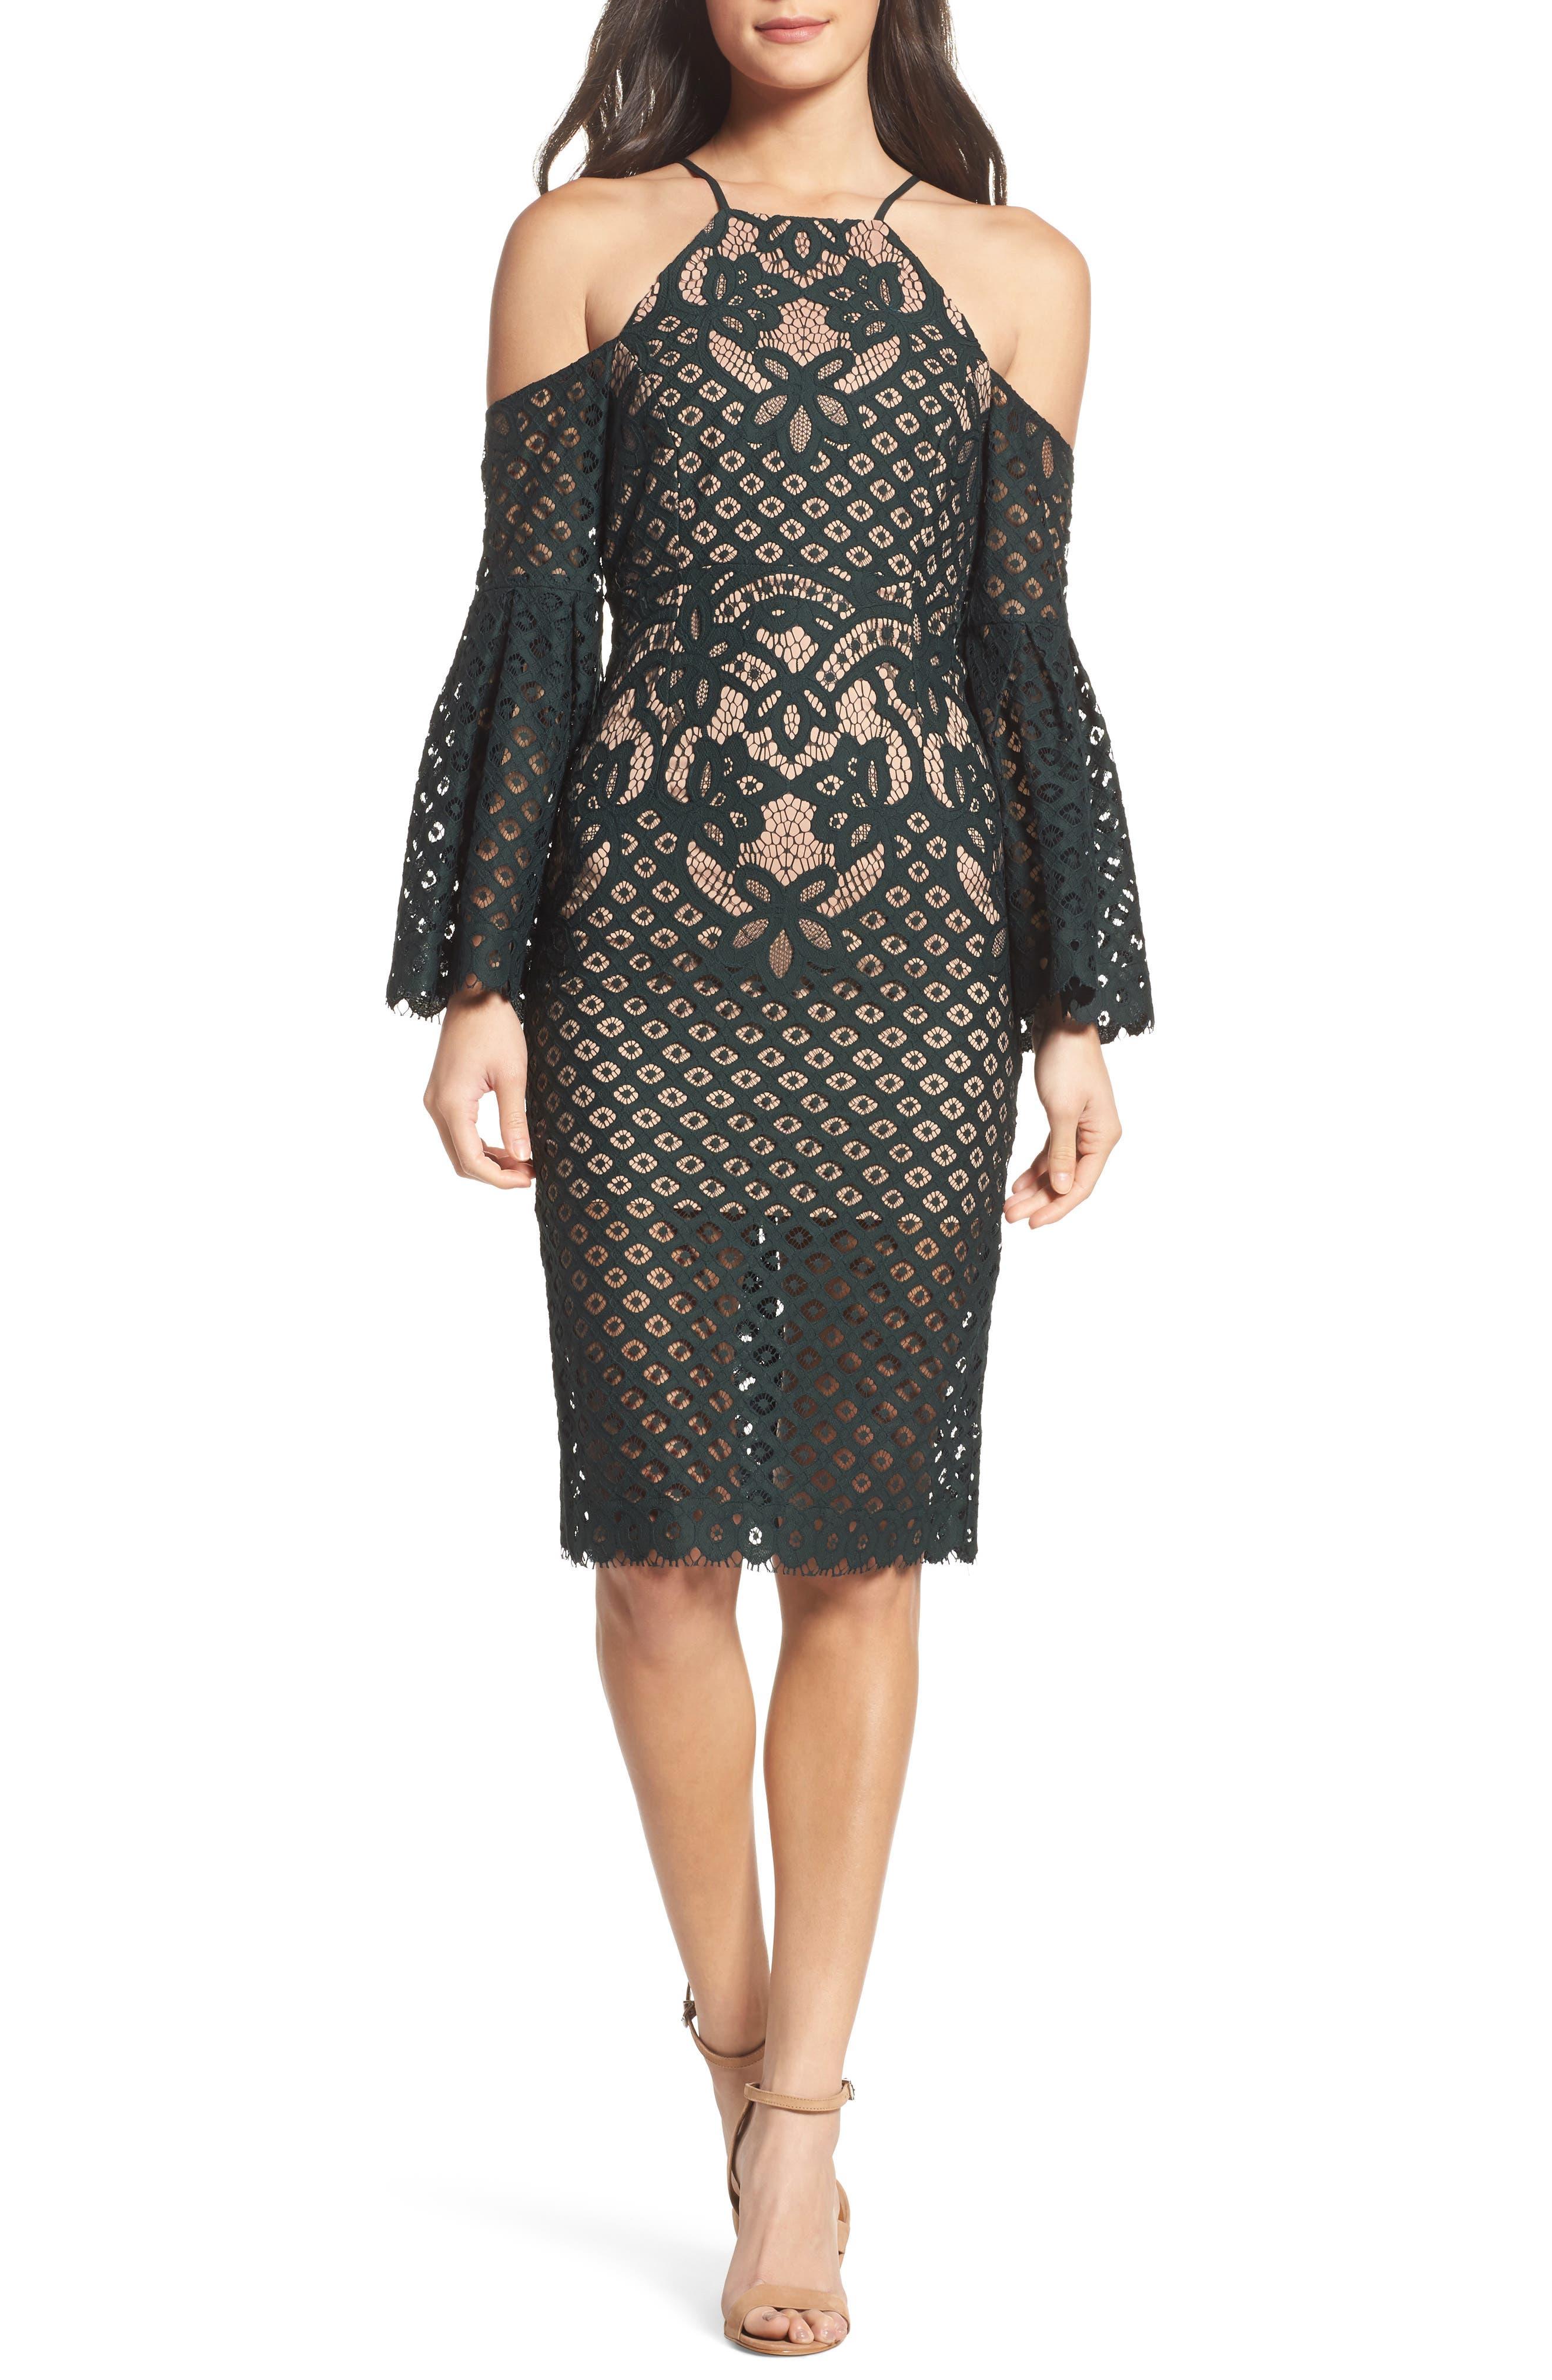 Alternate Image 1 Selected - Bardot 'Mila' Cold Shoulder Lace Midi Dress